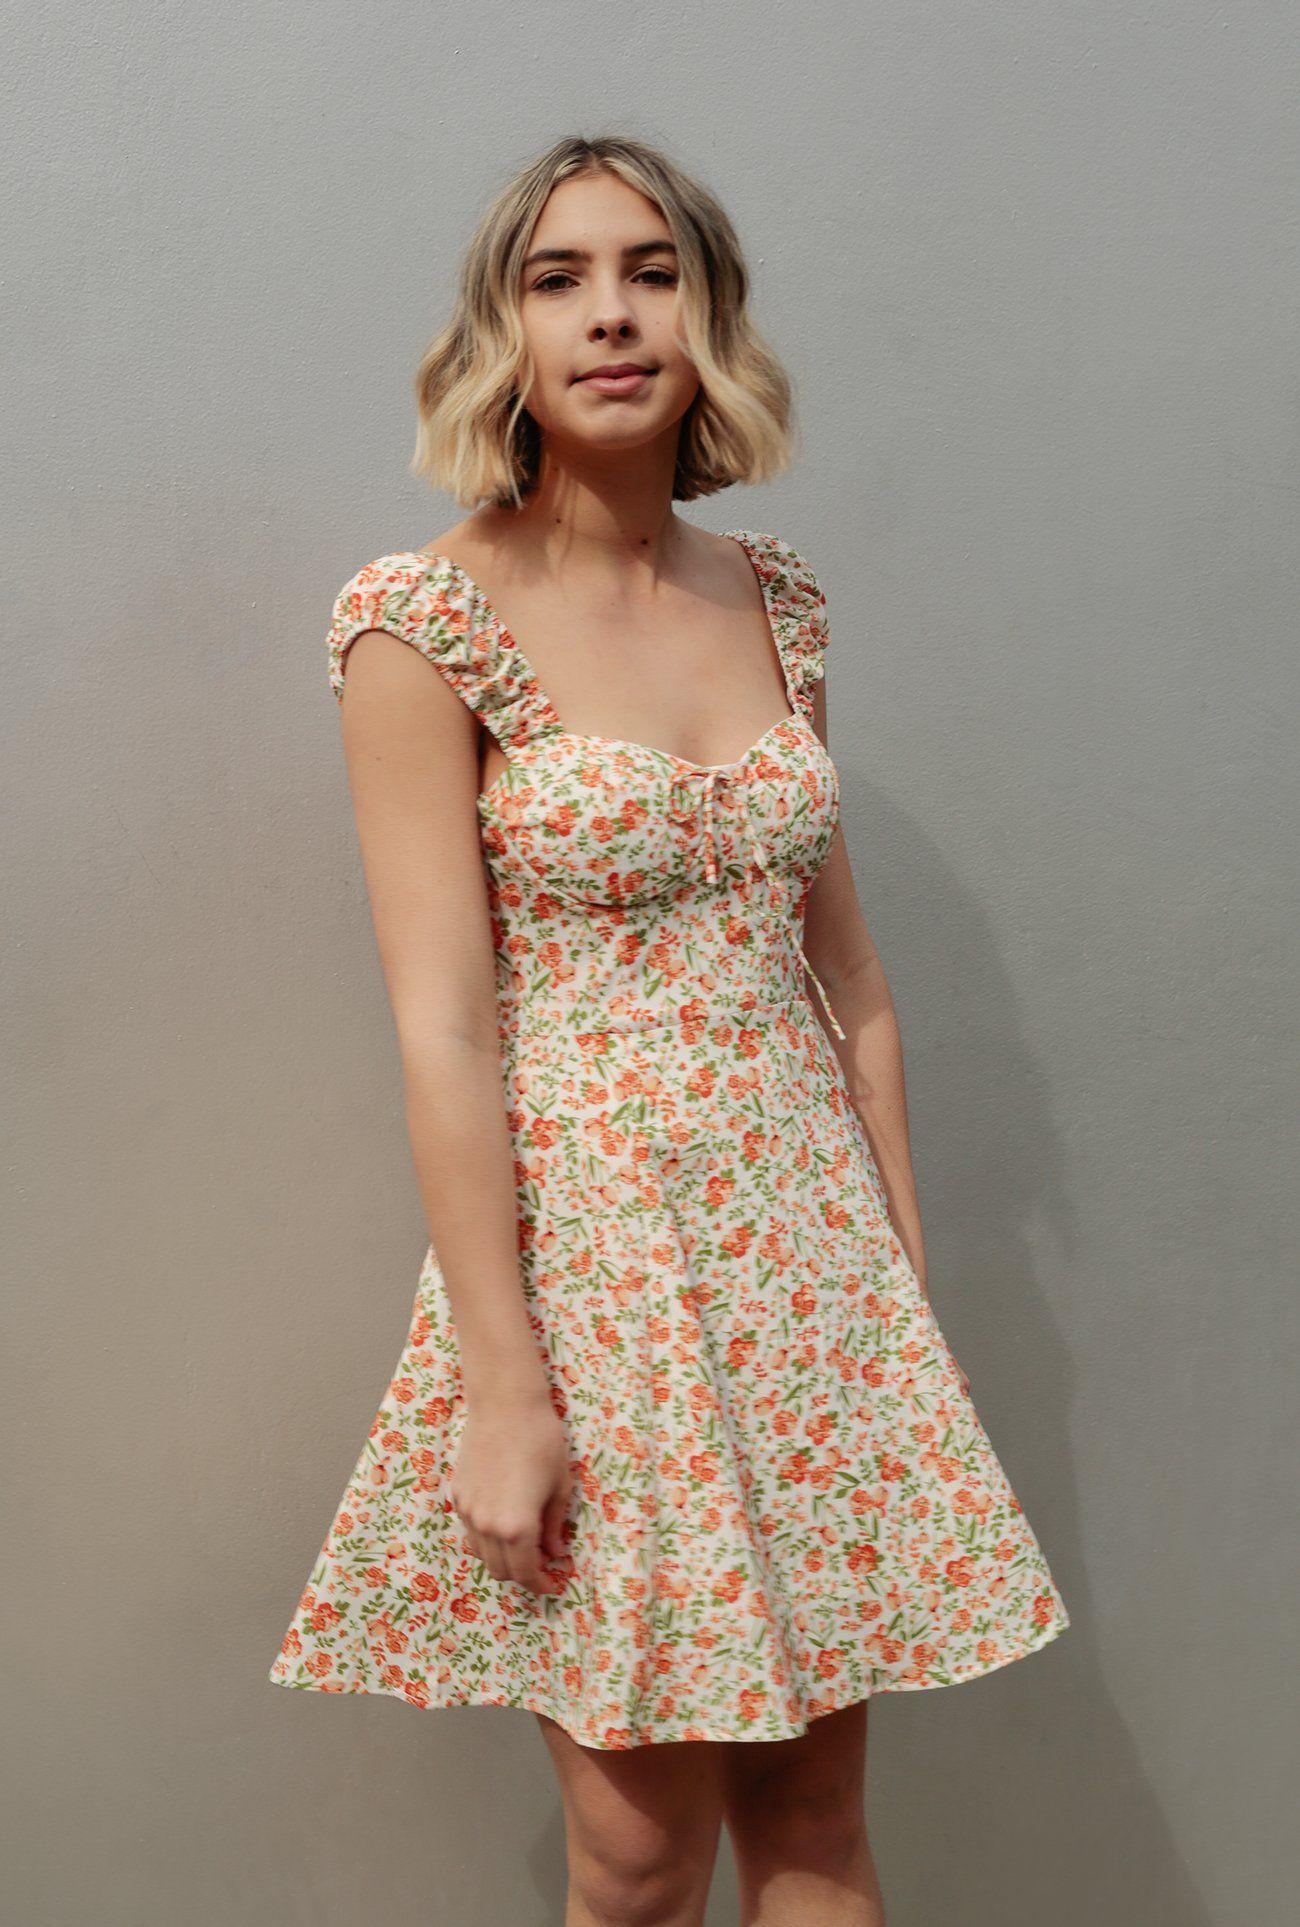 Floral Sweetheart Dress Azalea Dresses Sweetheart Dress Sewing Dresses [ 1927 x 1300 Pixel ]